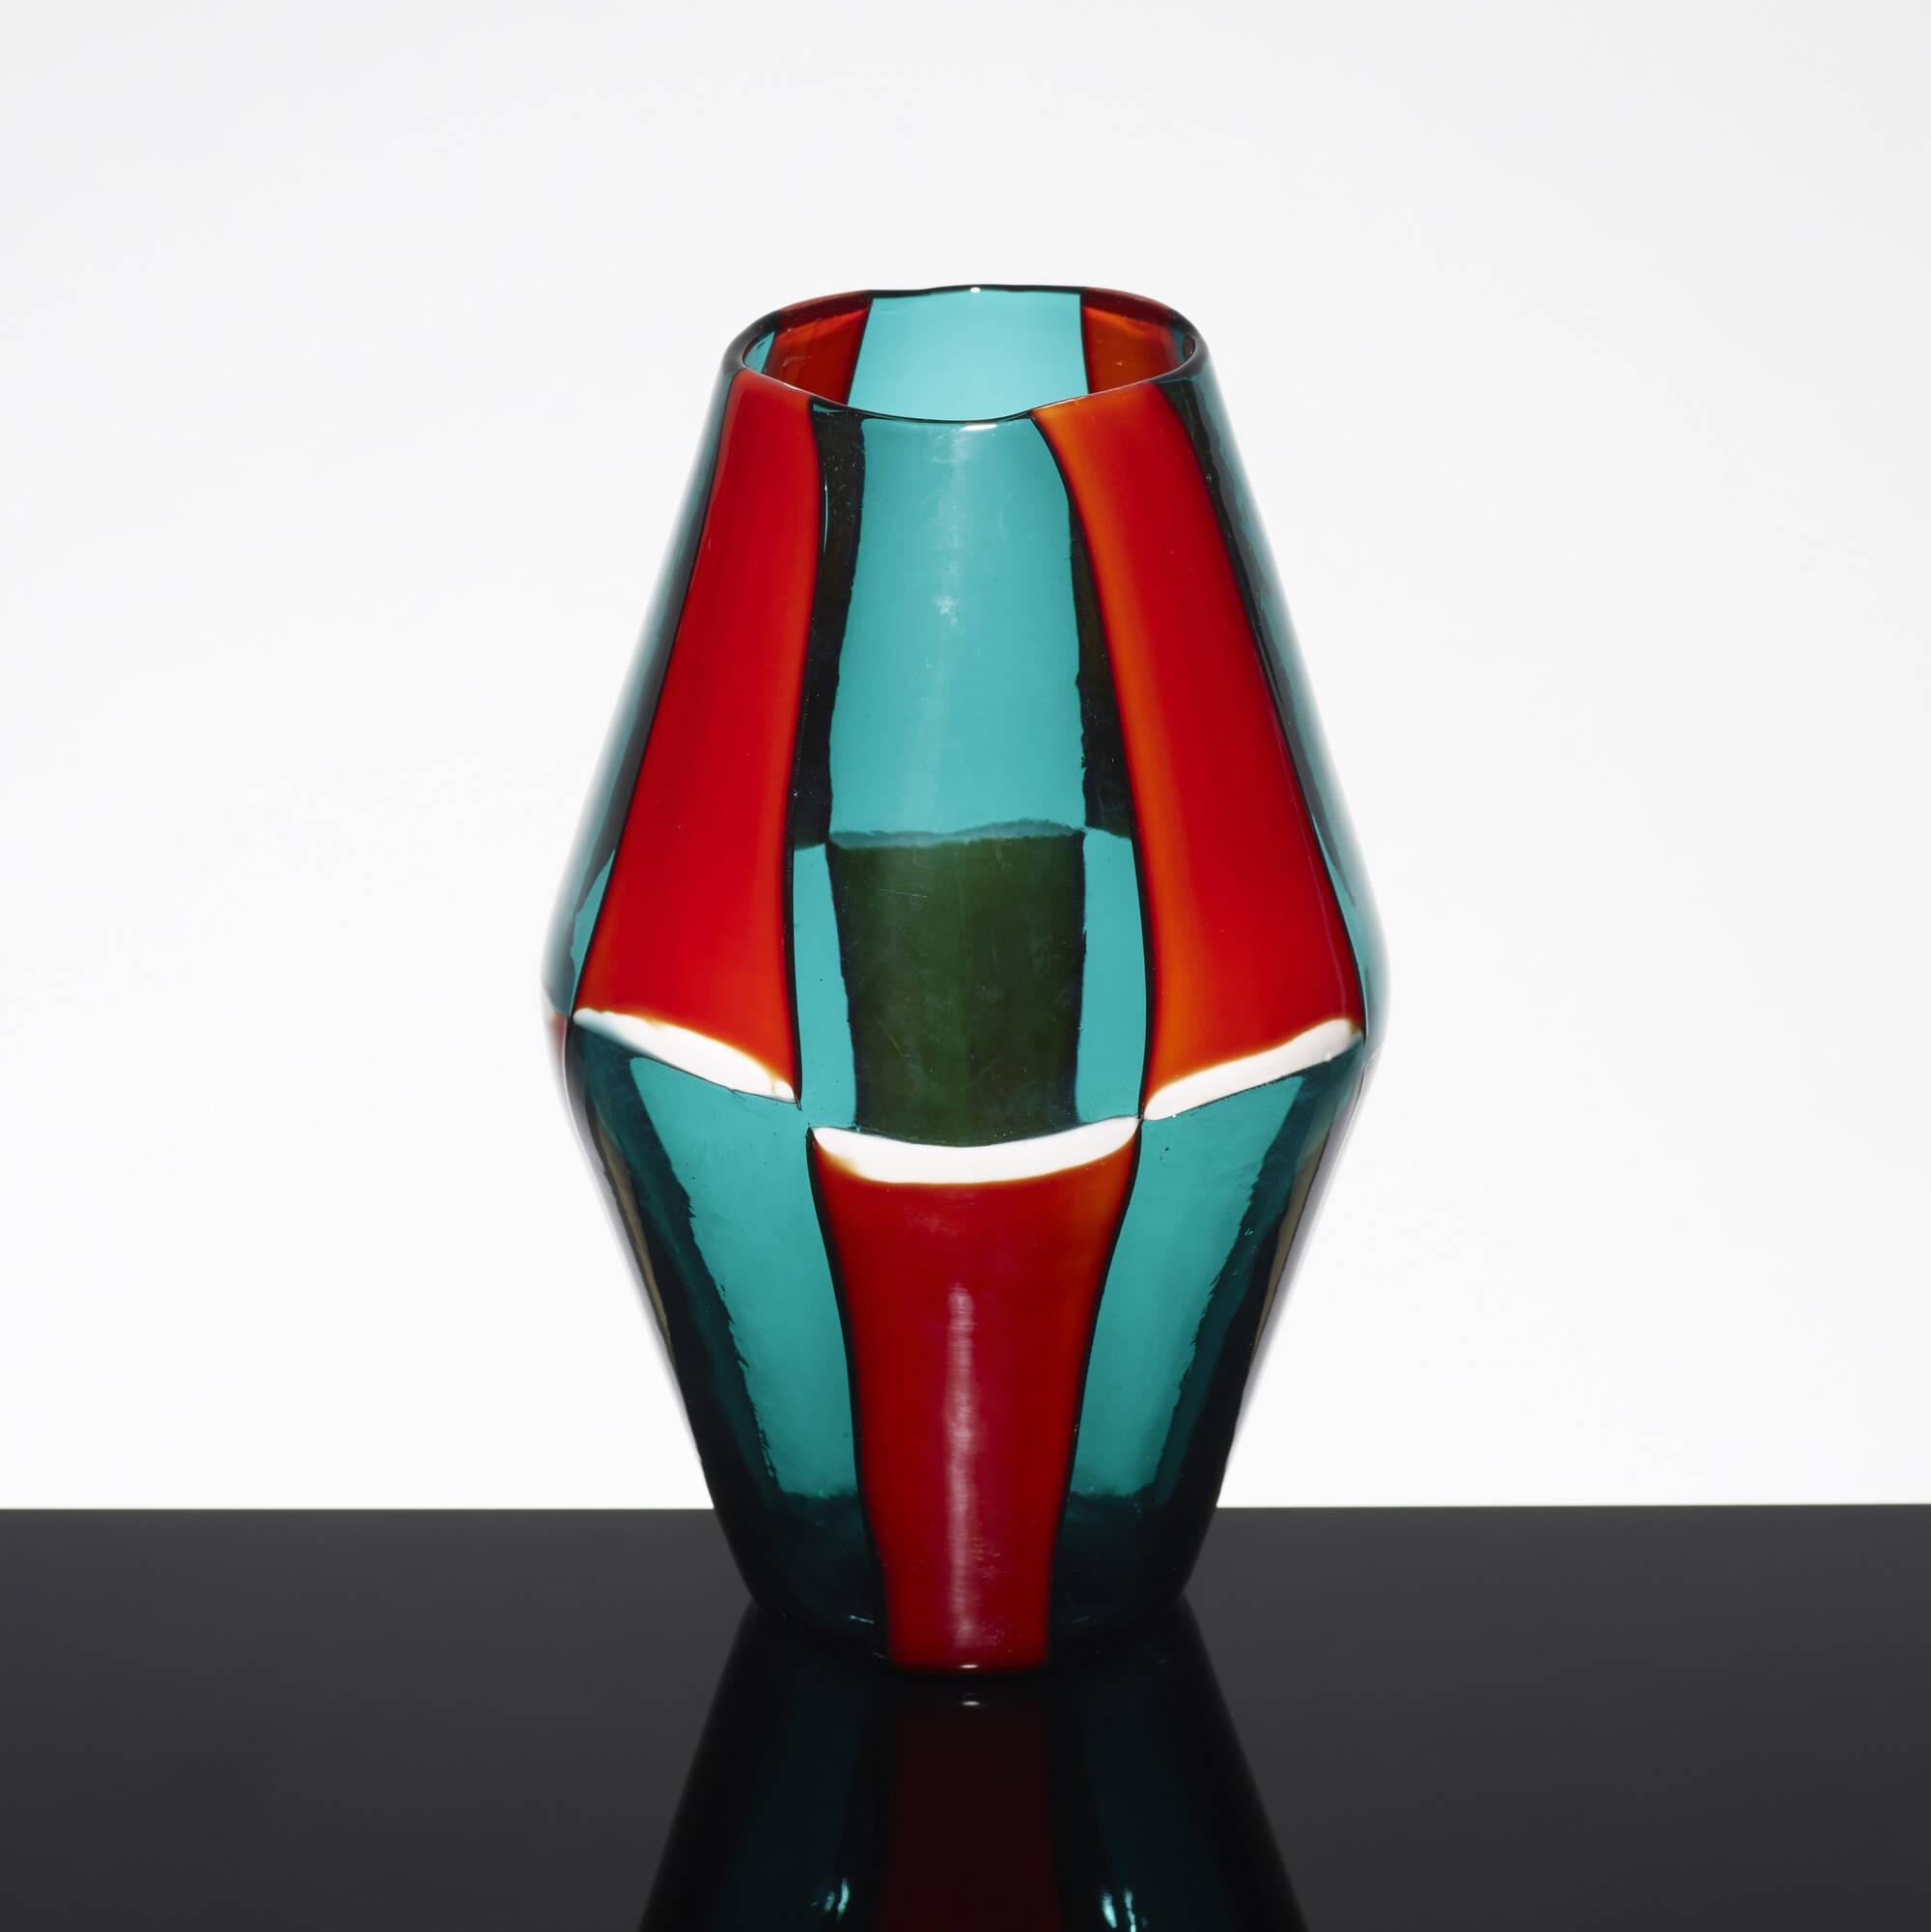 144: Fulvio Bianconi / Bi-Pezzato vase, model 4318 (3 of 5)